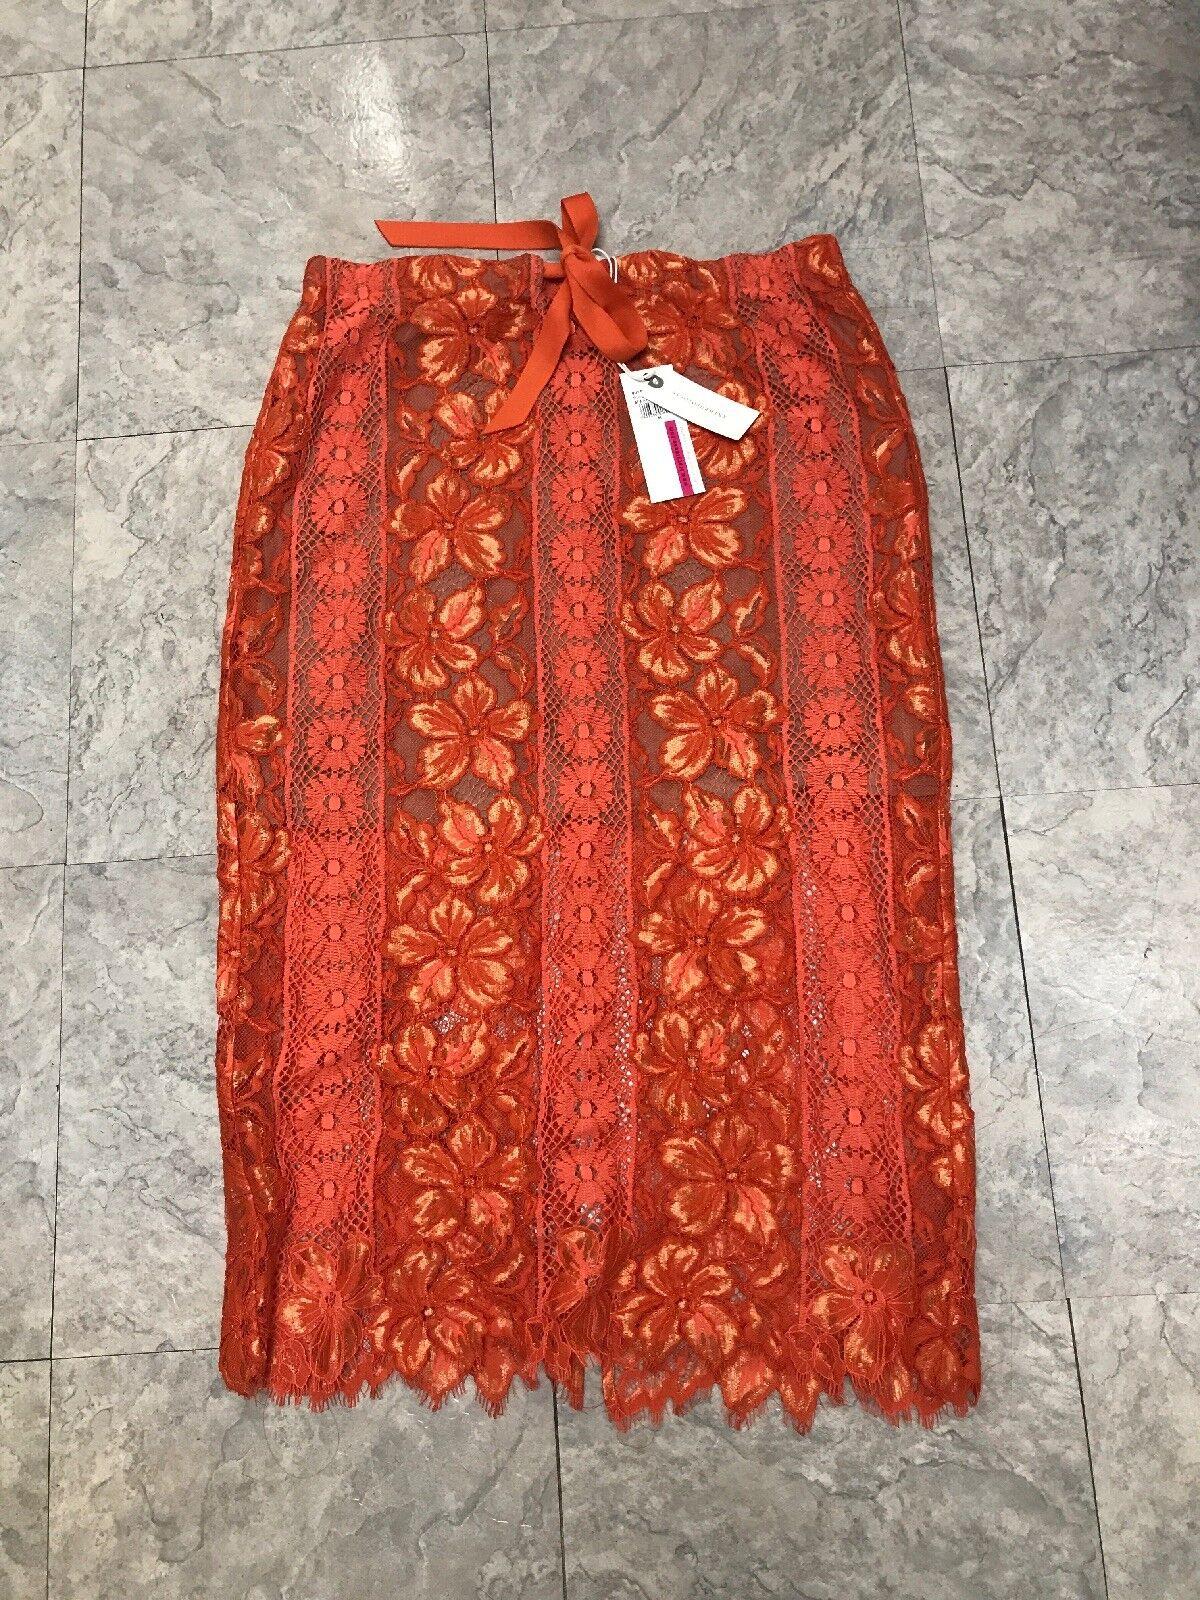 New Anthropologie Tracy Reese orange Lace Midi Skirt Size Medium African Tulip